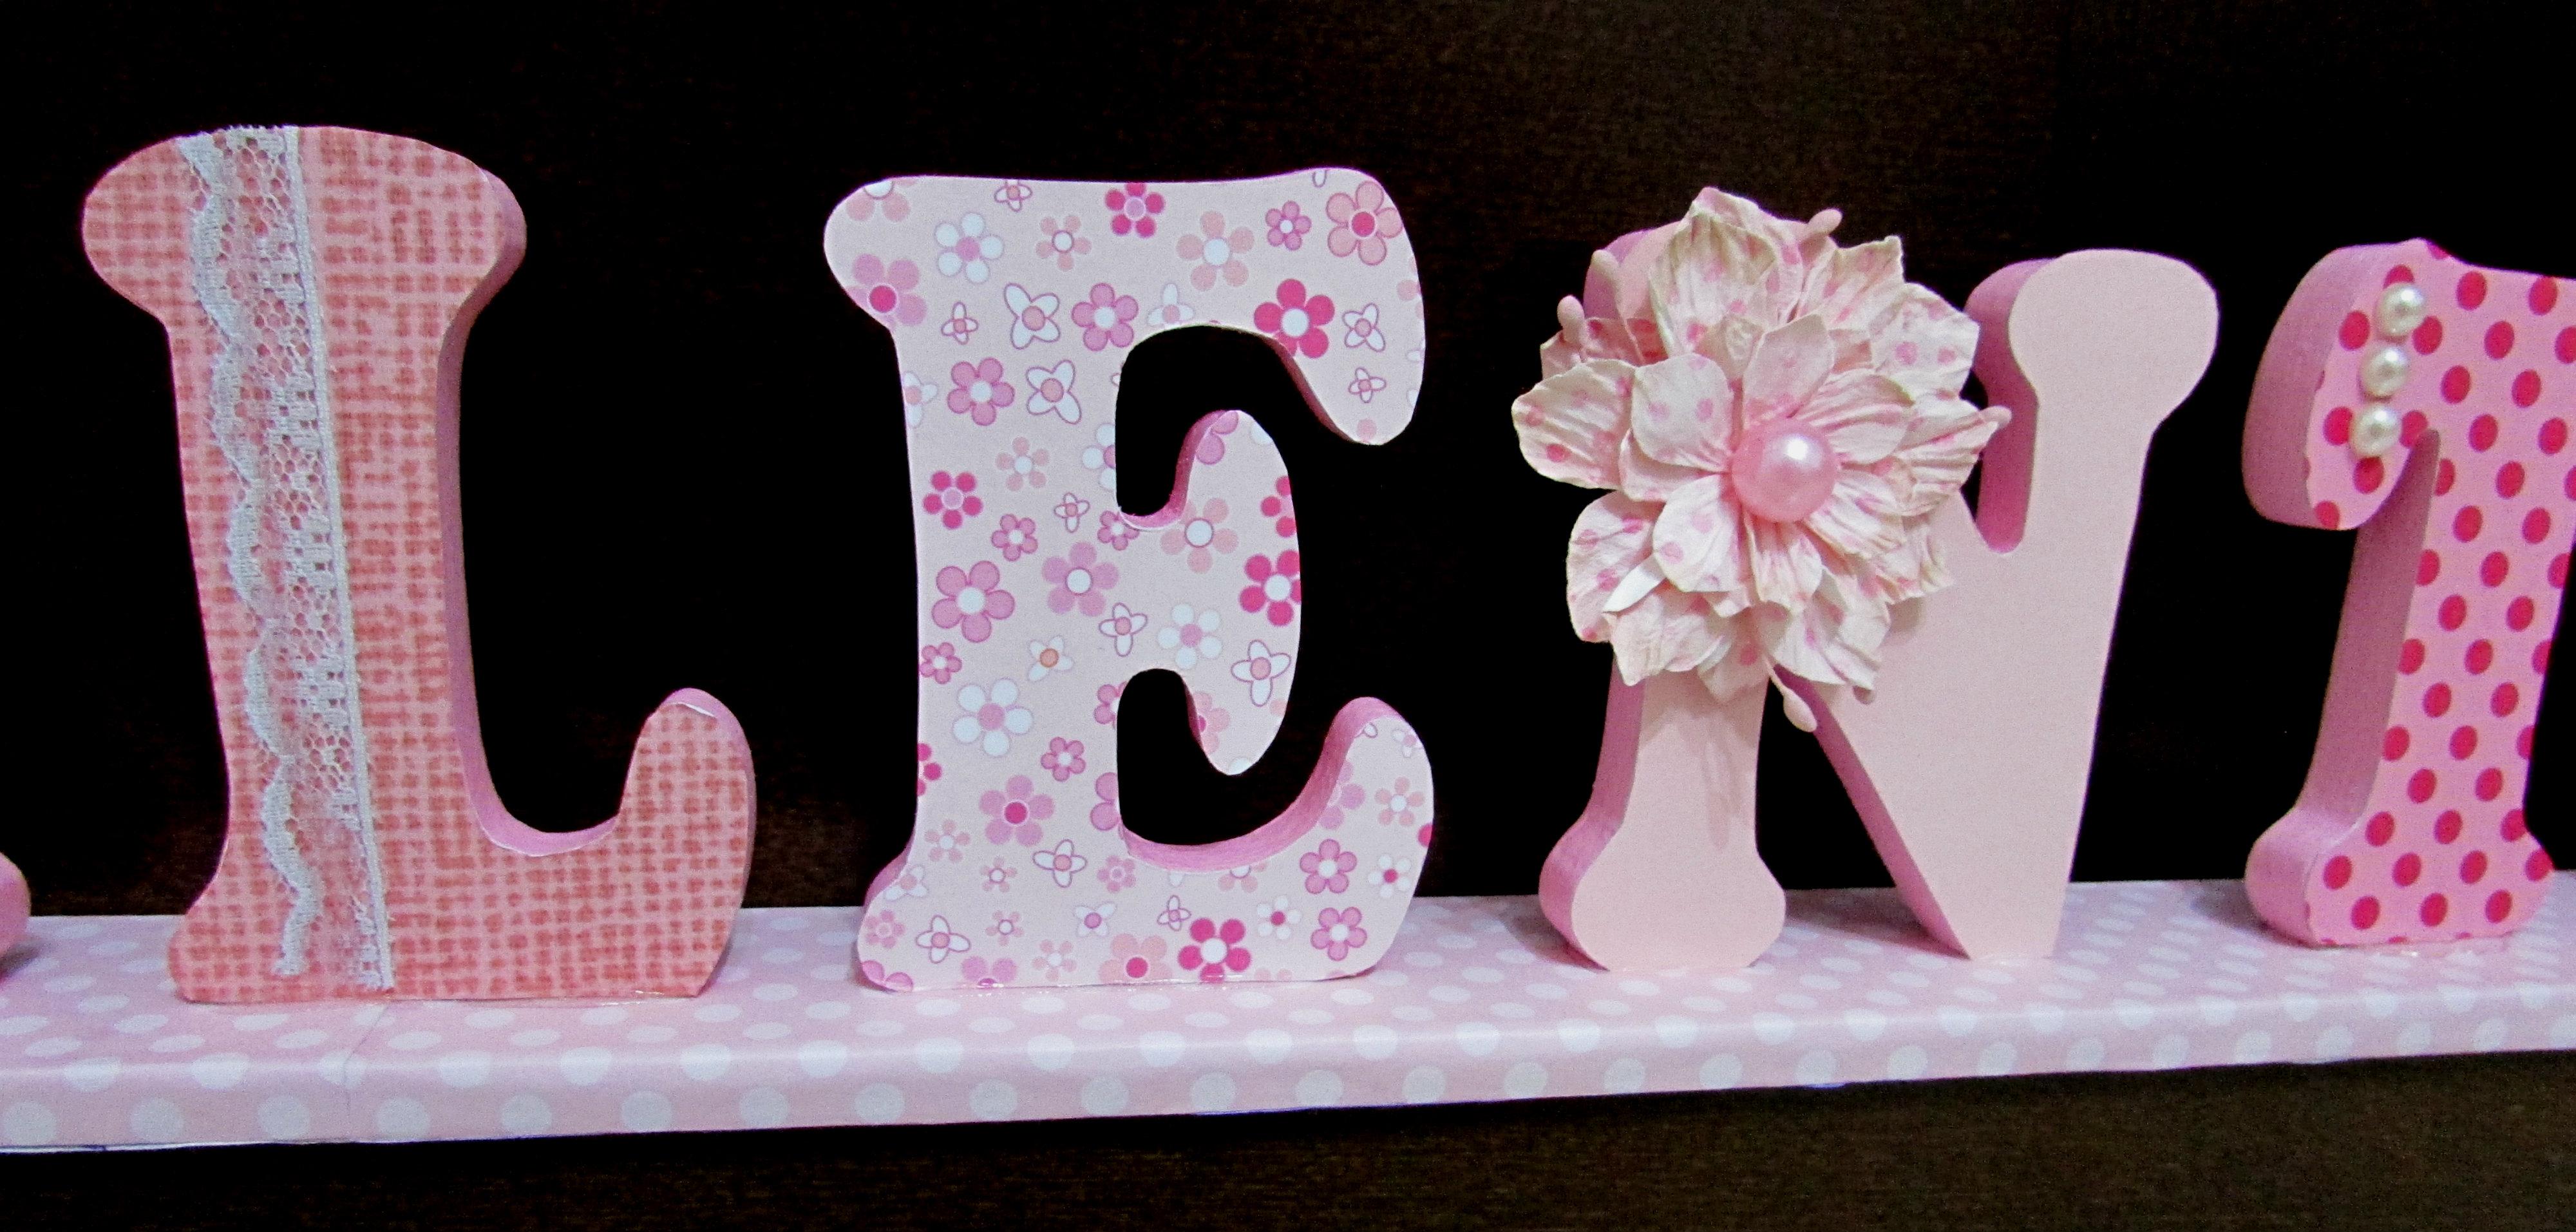 Letra decorada em mdf (12 00 a letra) Tutti Belli Artesanatos Elo7 #B01B46 4000x1913